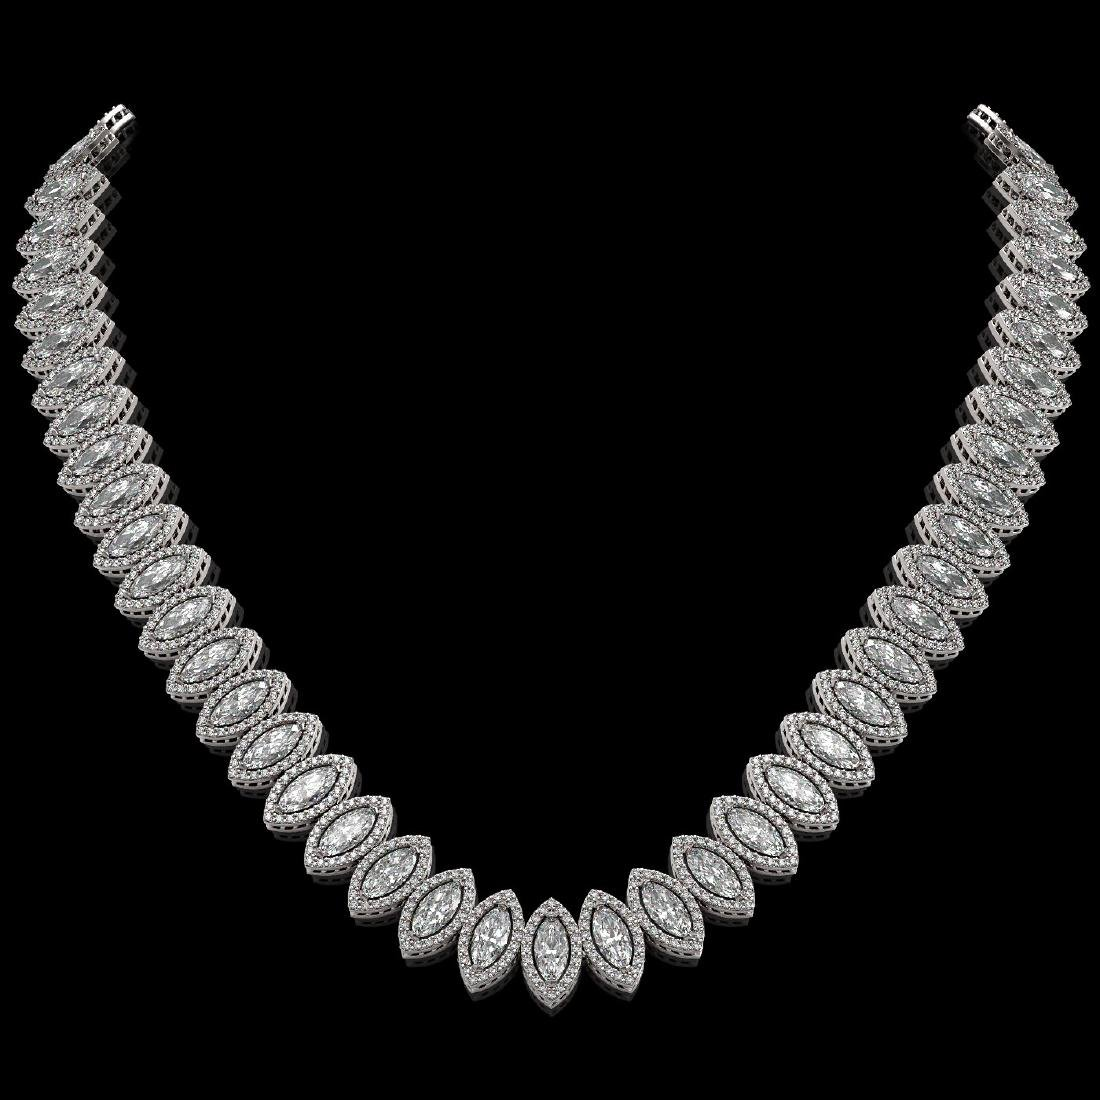 39.68 CTW Marquise Diamond Designer Necklace 18K White